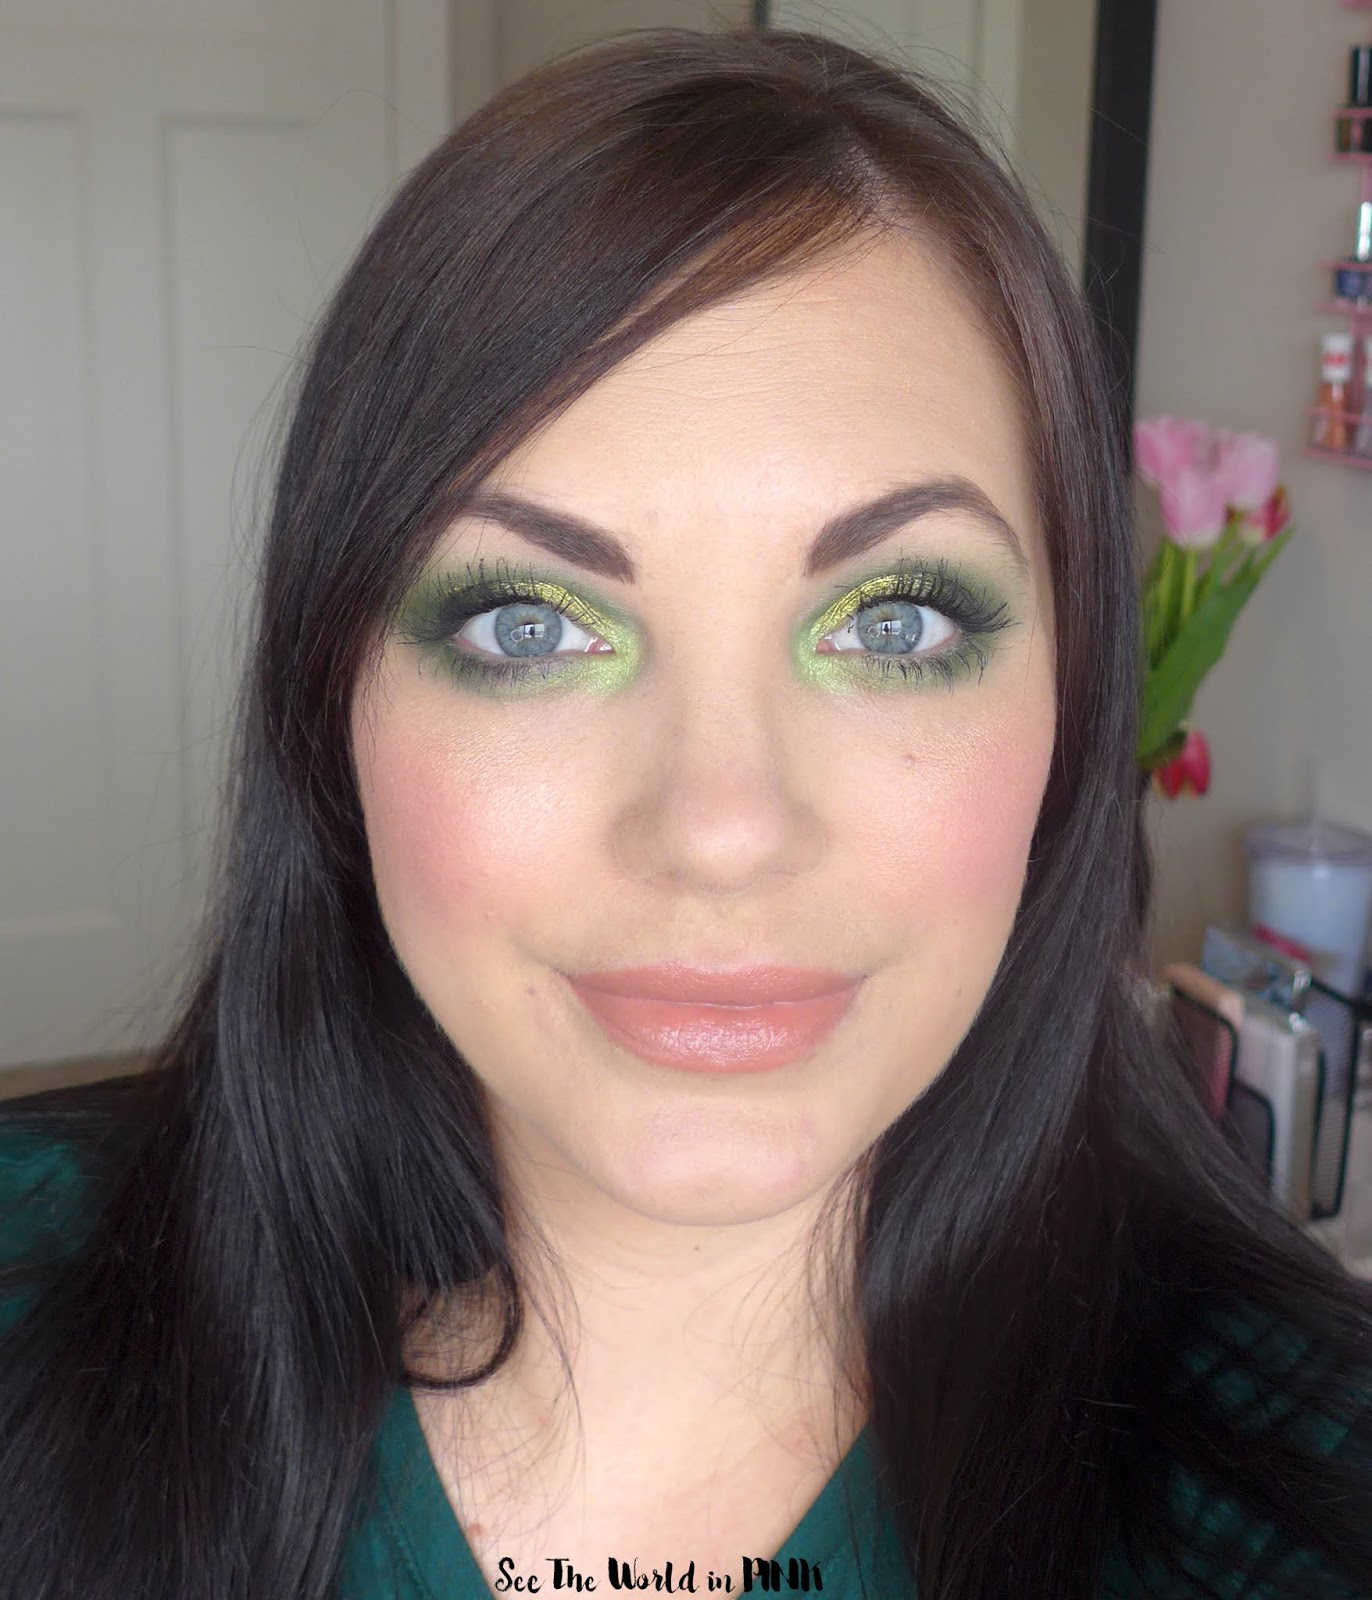 Natasha Denona Bloom Blush & Glow - Swatches, Looks and Review!